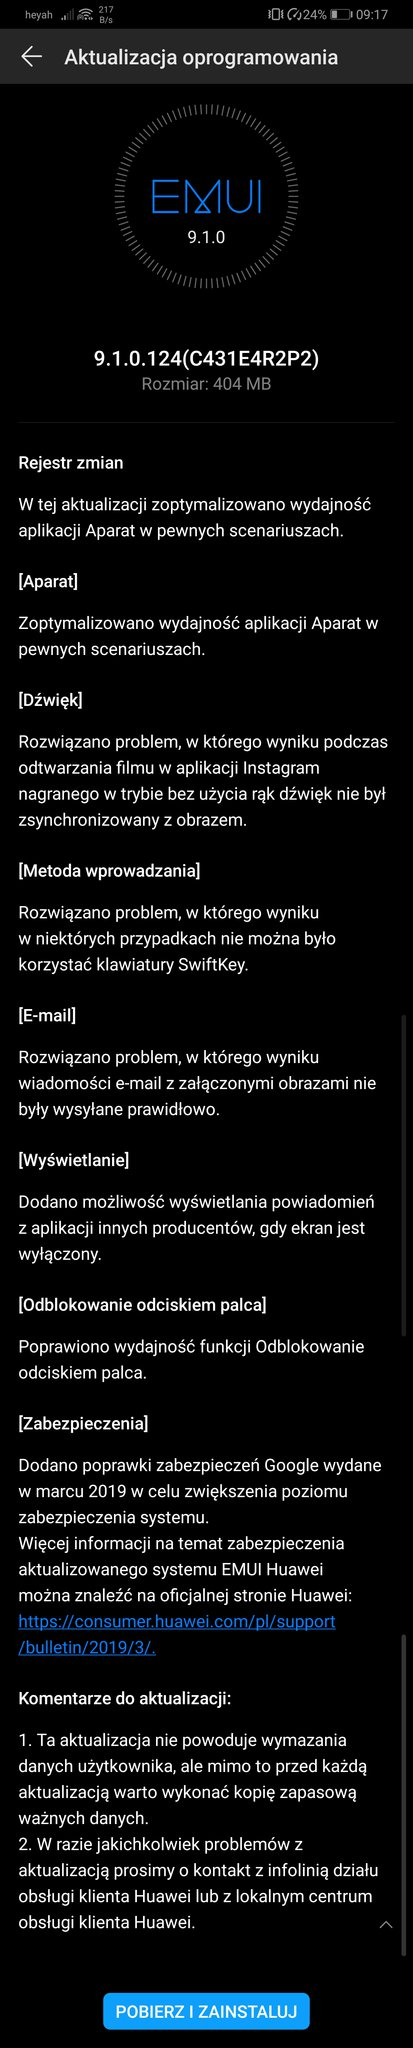 Screenshot_20190329_091722_com.huawei.android.hwouc